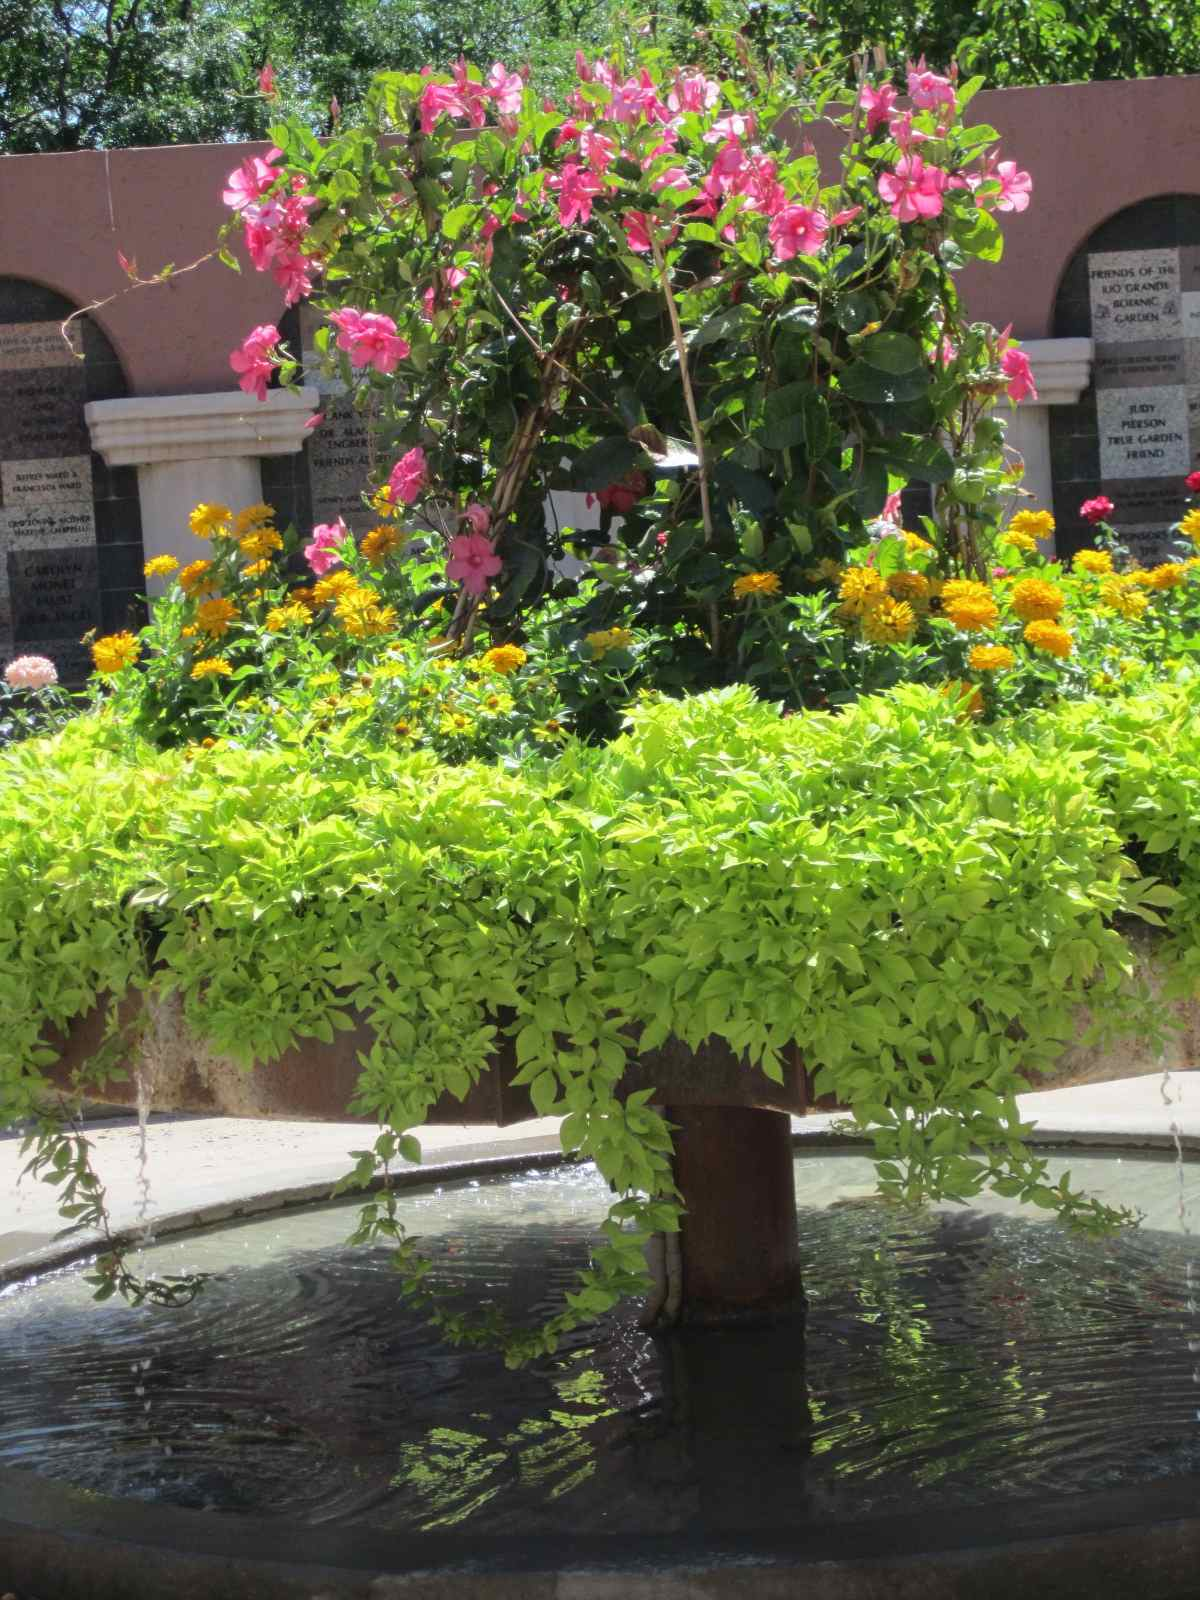 Roses And Other Gardening Joys: Albuquerque Botanic Garden